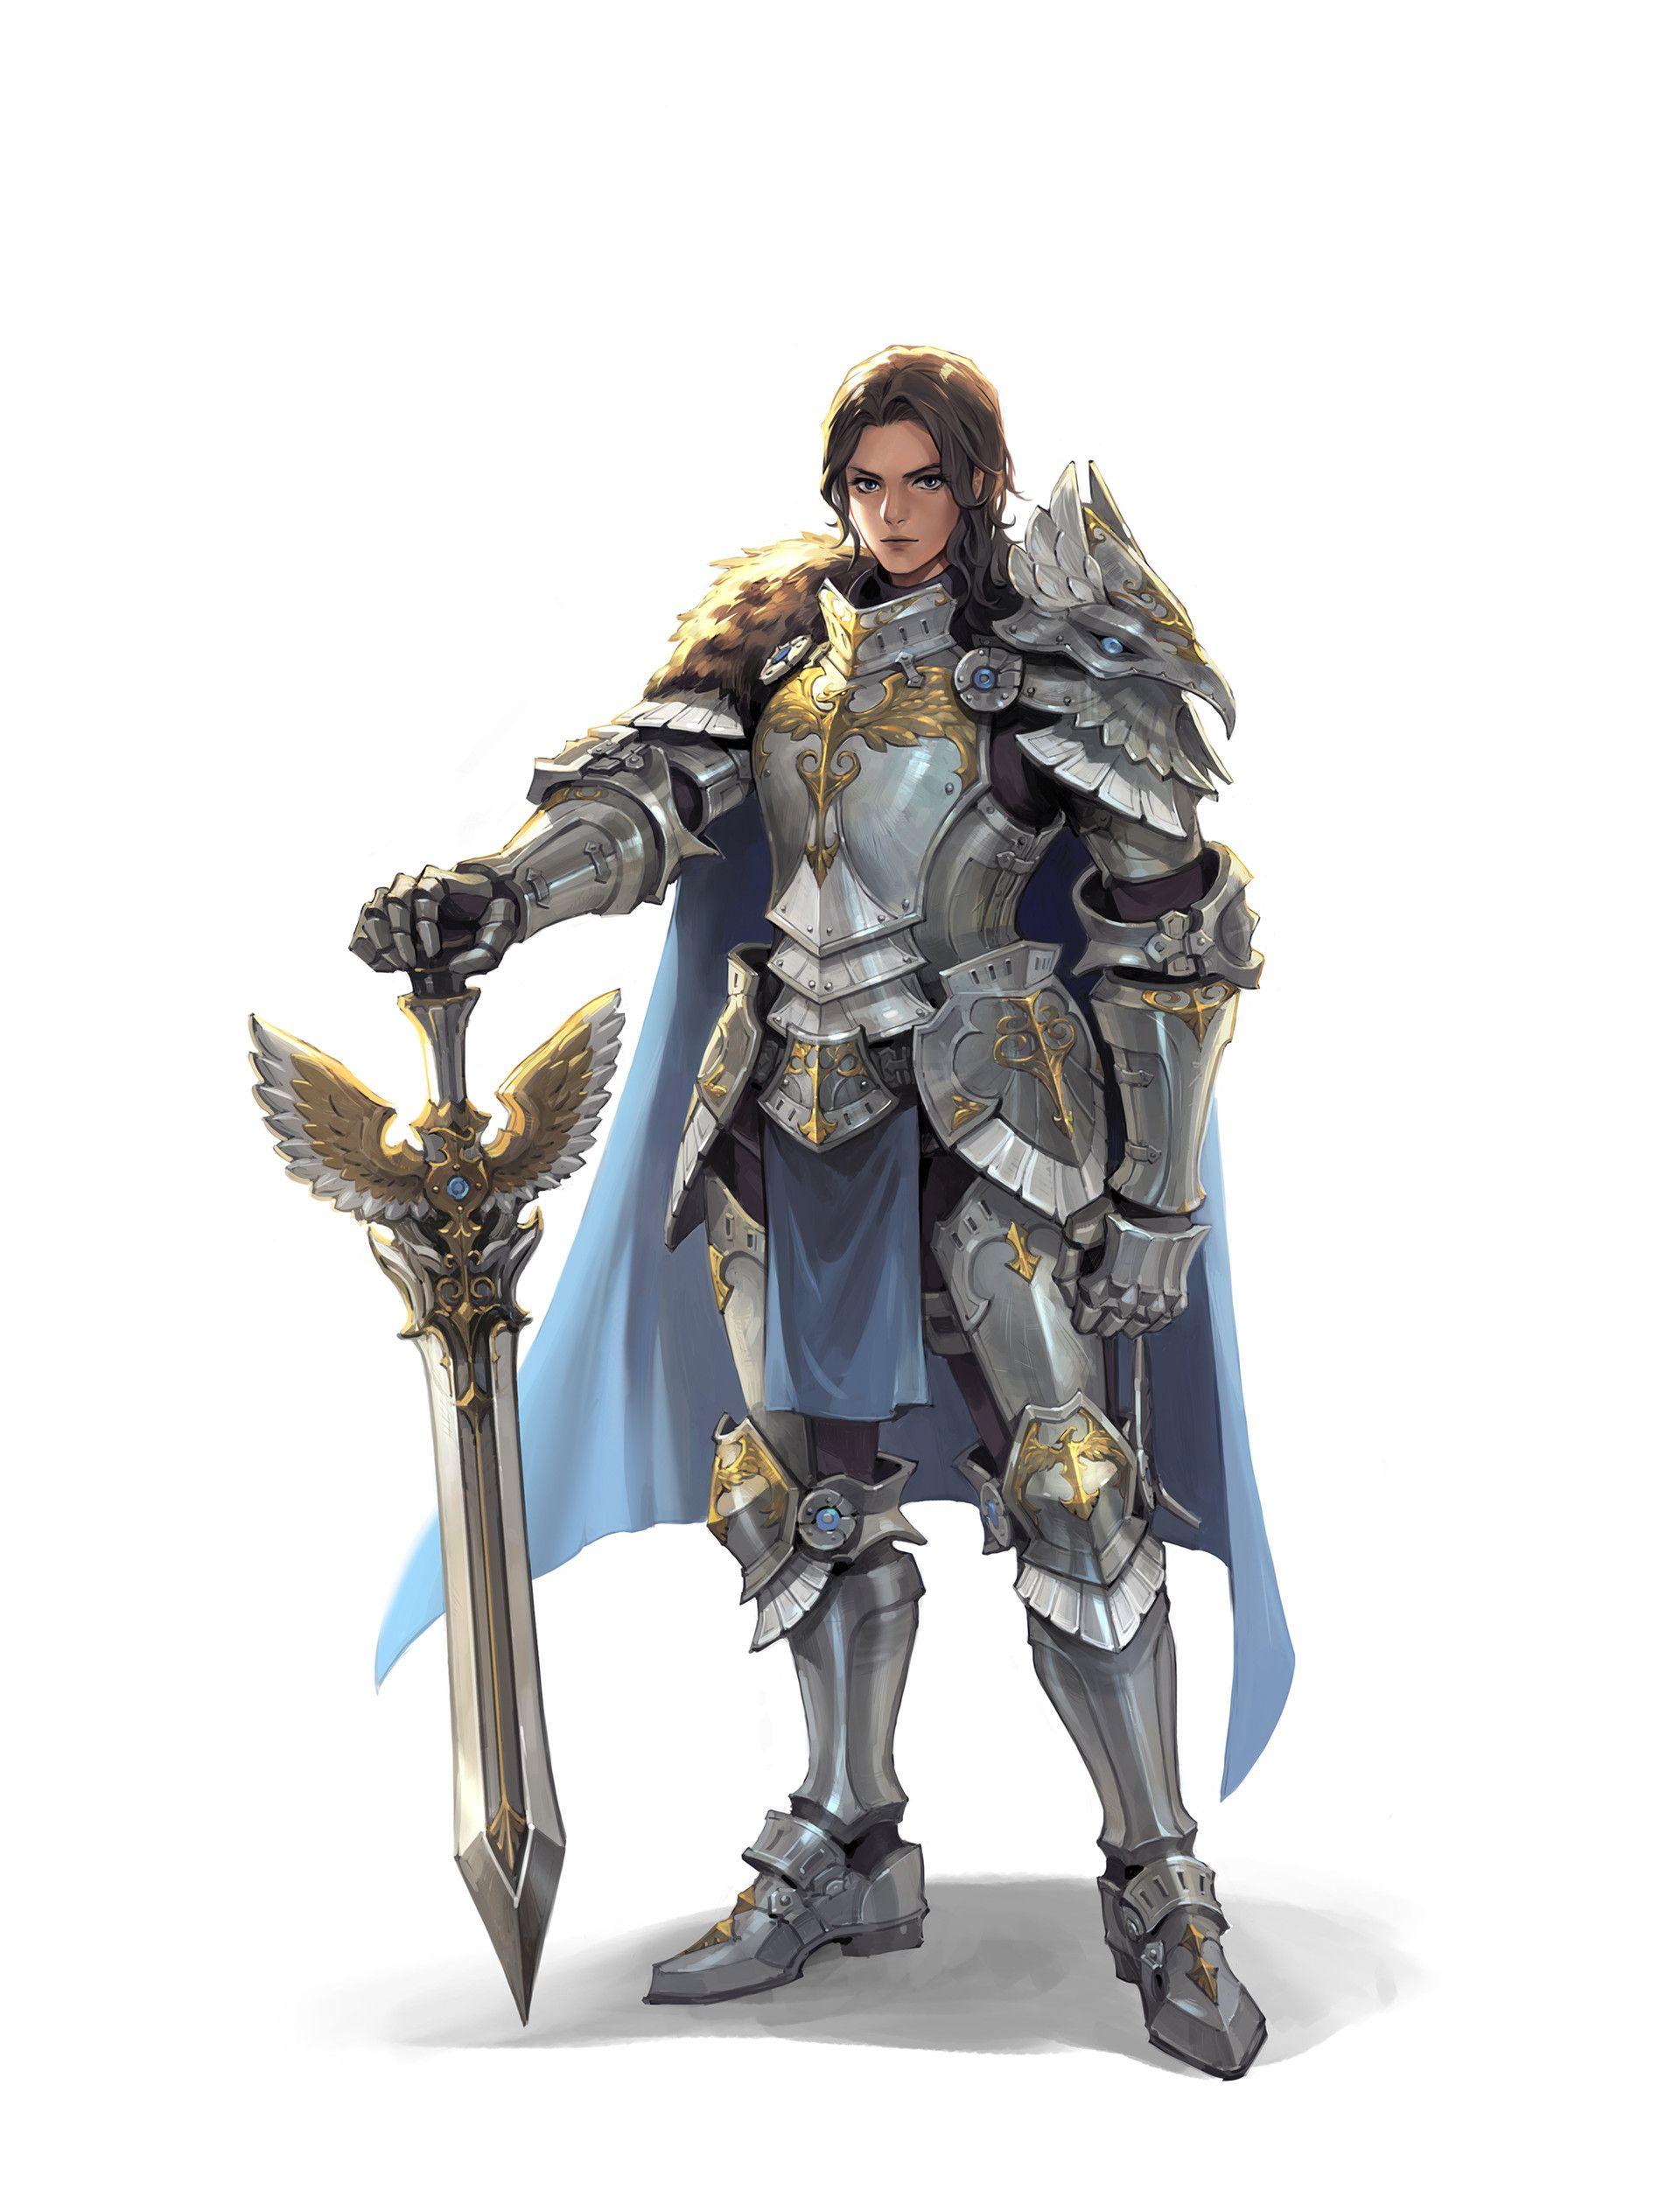 Artstation 160217 hawk armor sora kim fantasy pinterest artstation 160217 hawk armor sora kim publicscrutiny Gallery